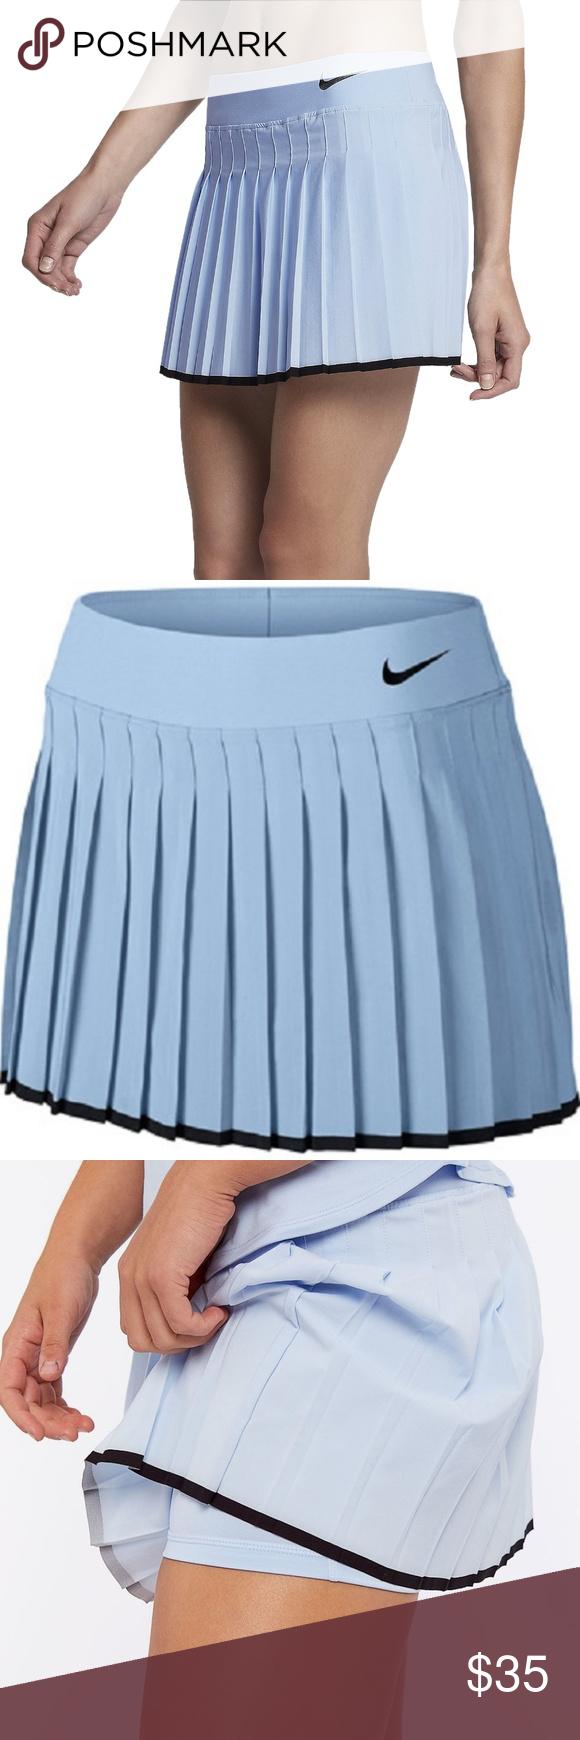 Nike Court Victory Tennis Skort Nwt 65 Xs Nwt With Images Tennis Skort Pleated Tennis Skirt Tennis Skirt